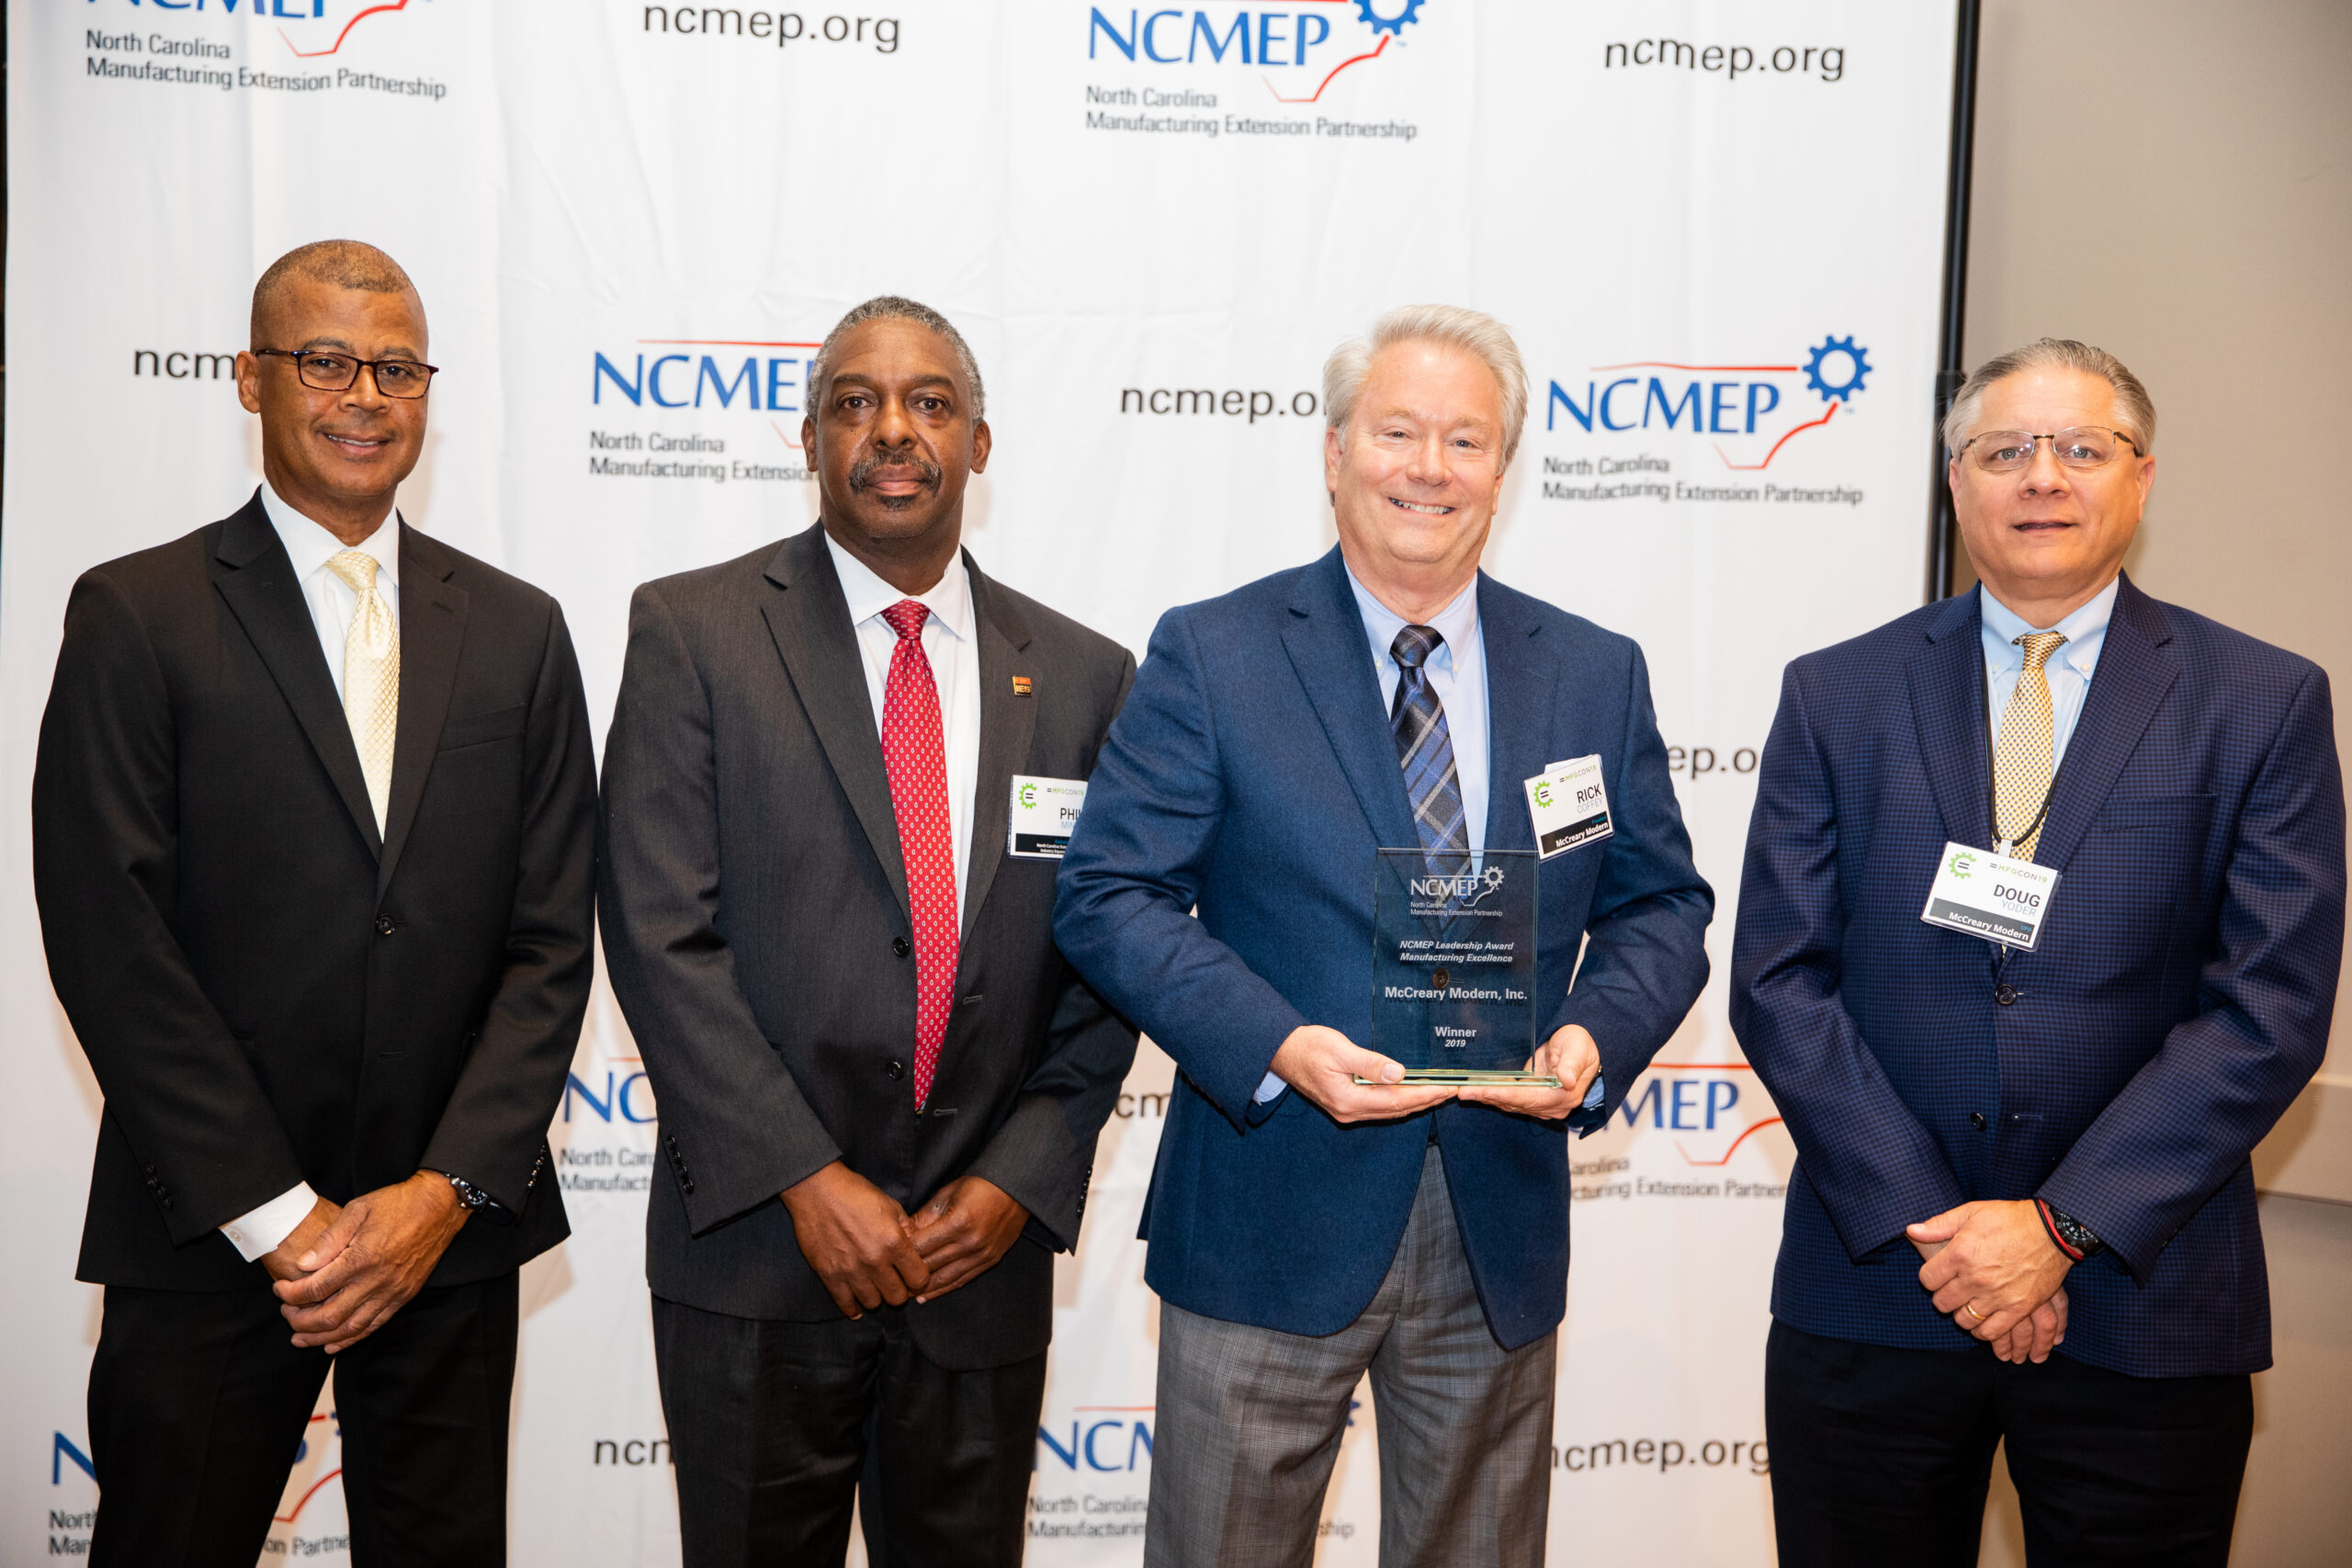 mfgCON19_Award-Winners-McCreary Modern Inc Photo